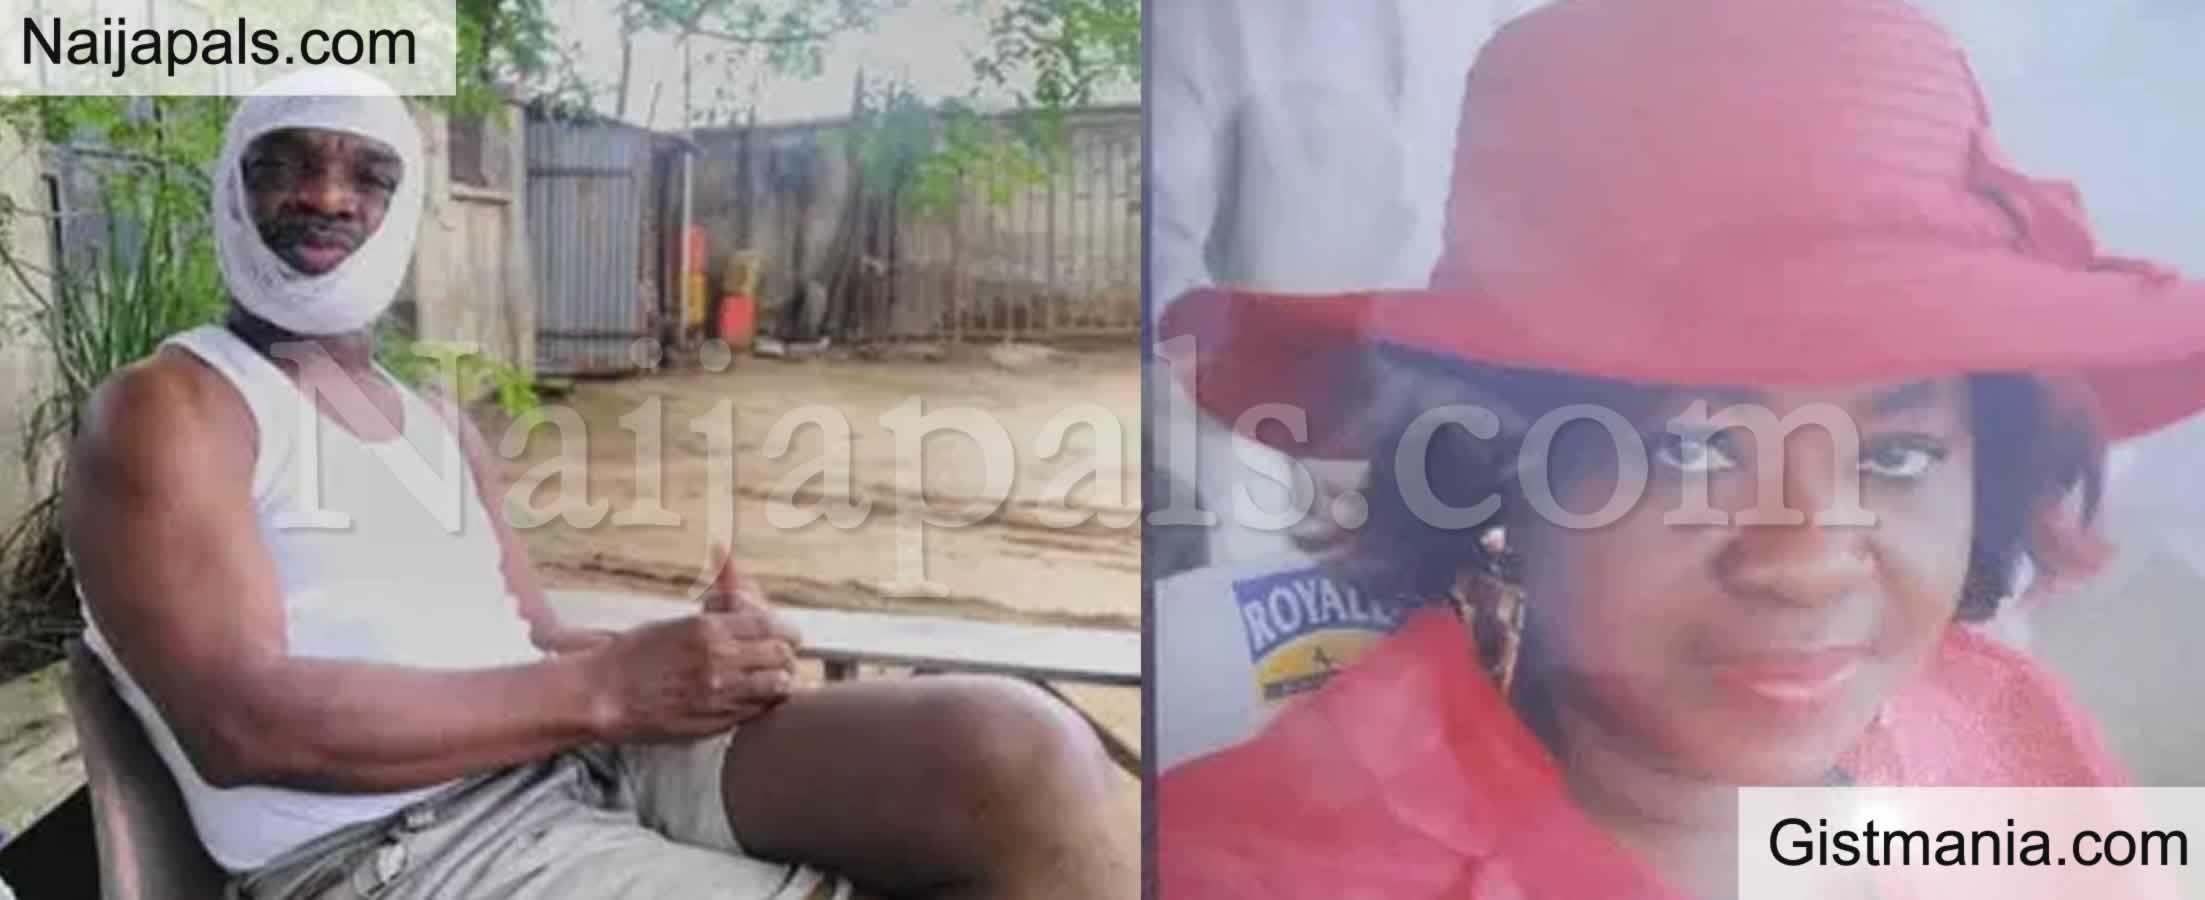 <img alt='.' class='lazyload' data-src='https://img.gistmania.com/emot/shocked.gif' /> <b>How Our Houseboy Killed My Wife on Her Birthday, Then Tried to Kill Me Too</b> - Nigerian Man